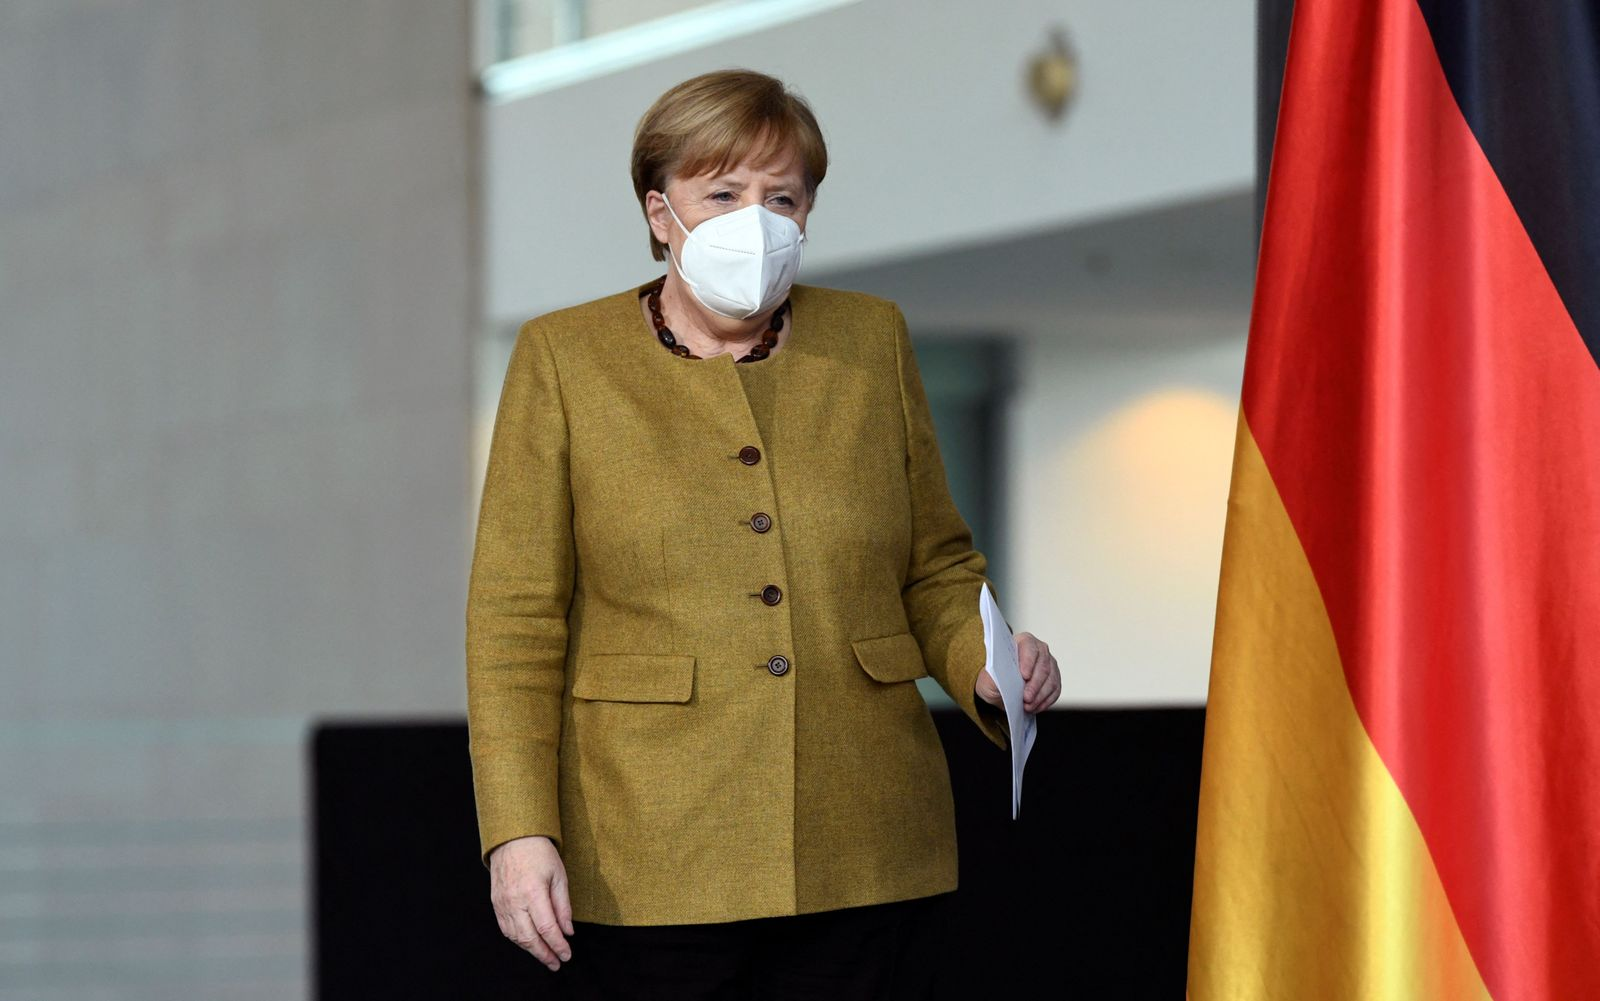 GERMANY-G7-HEALTH-VIRUS-VACCINES